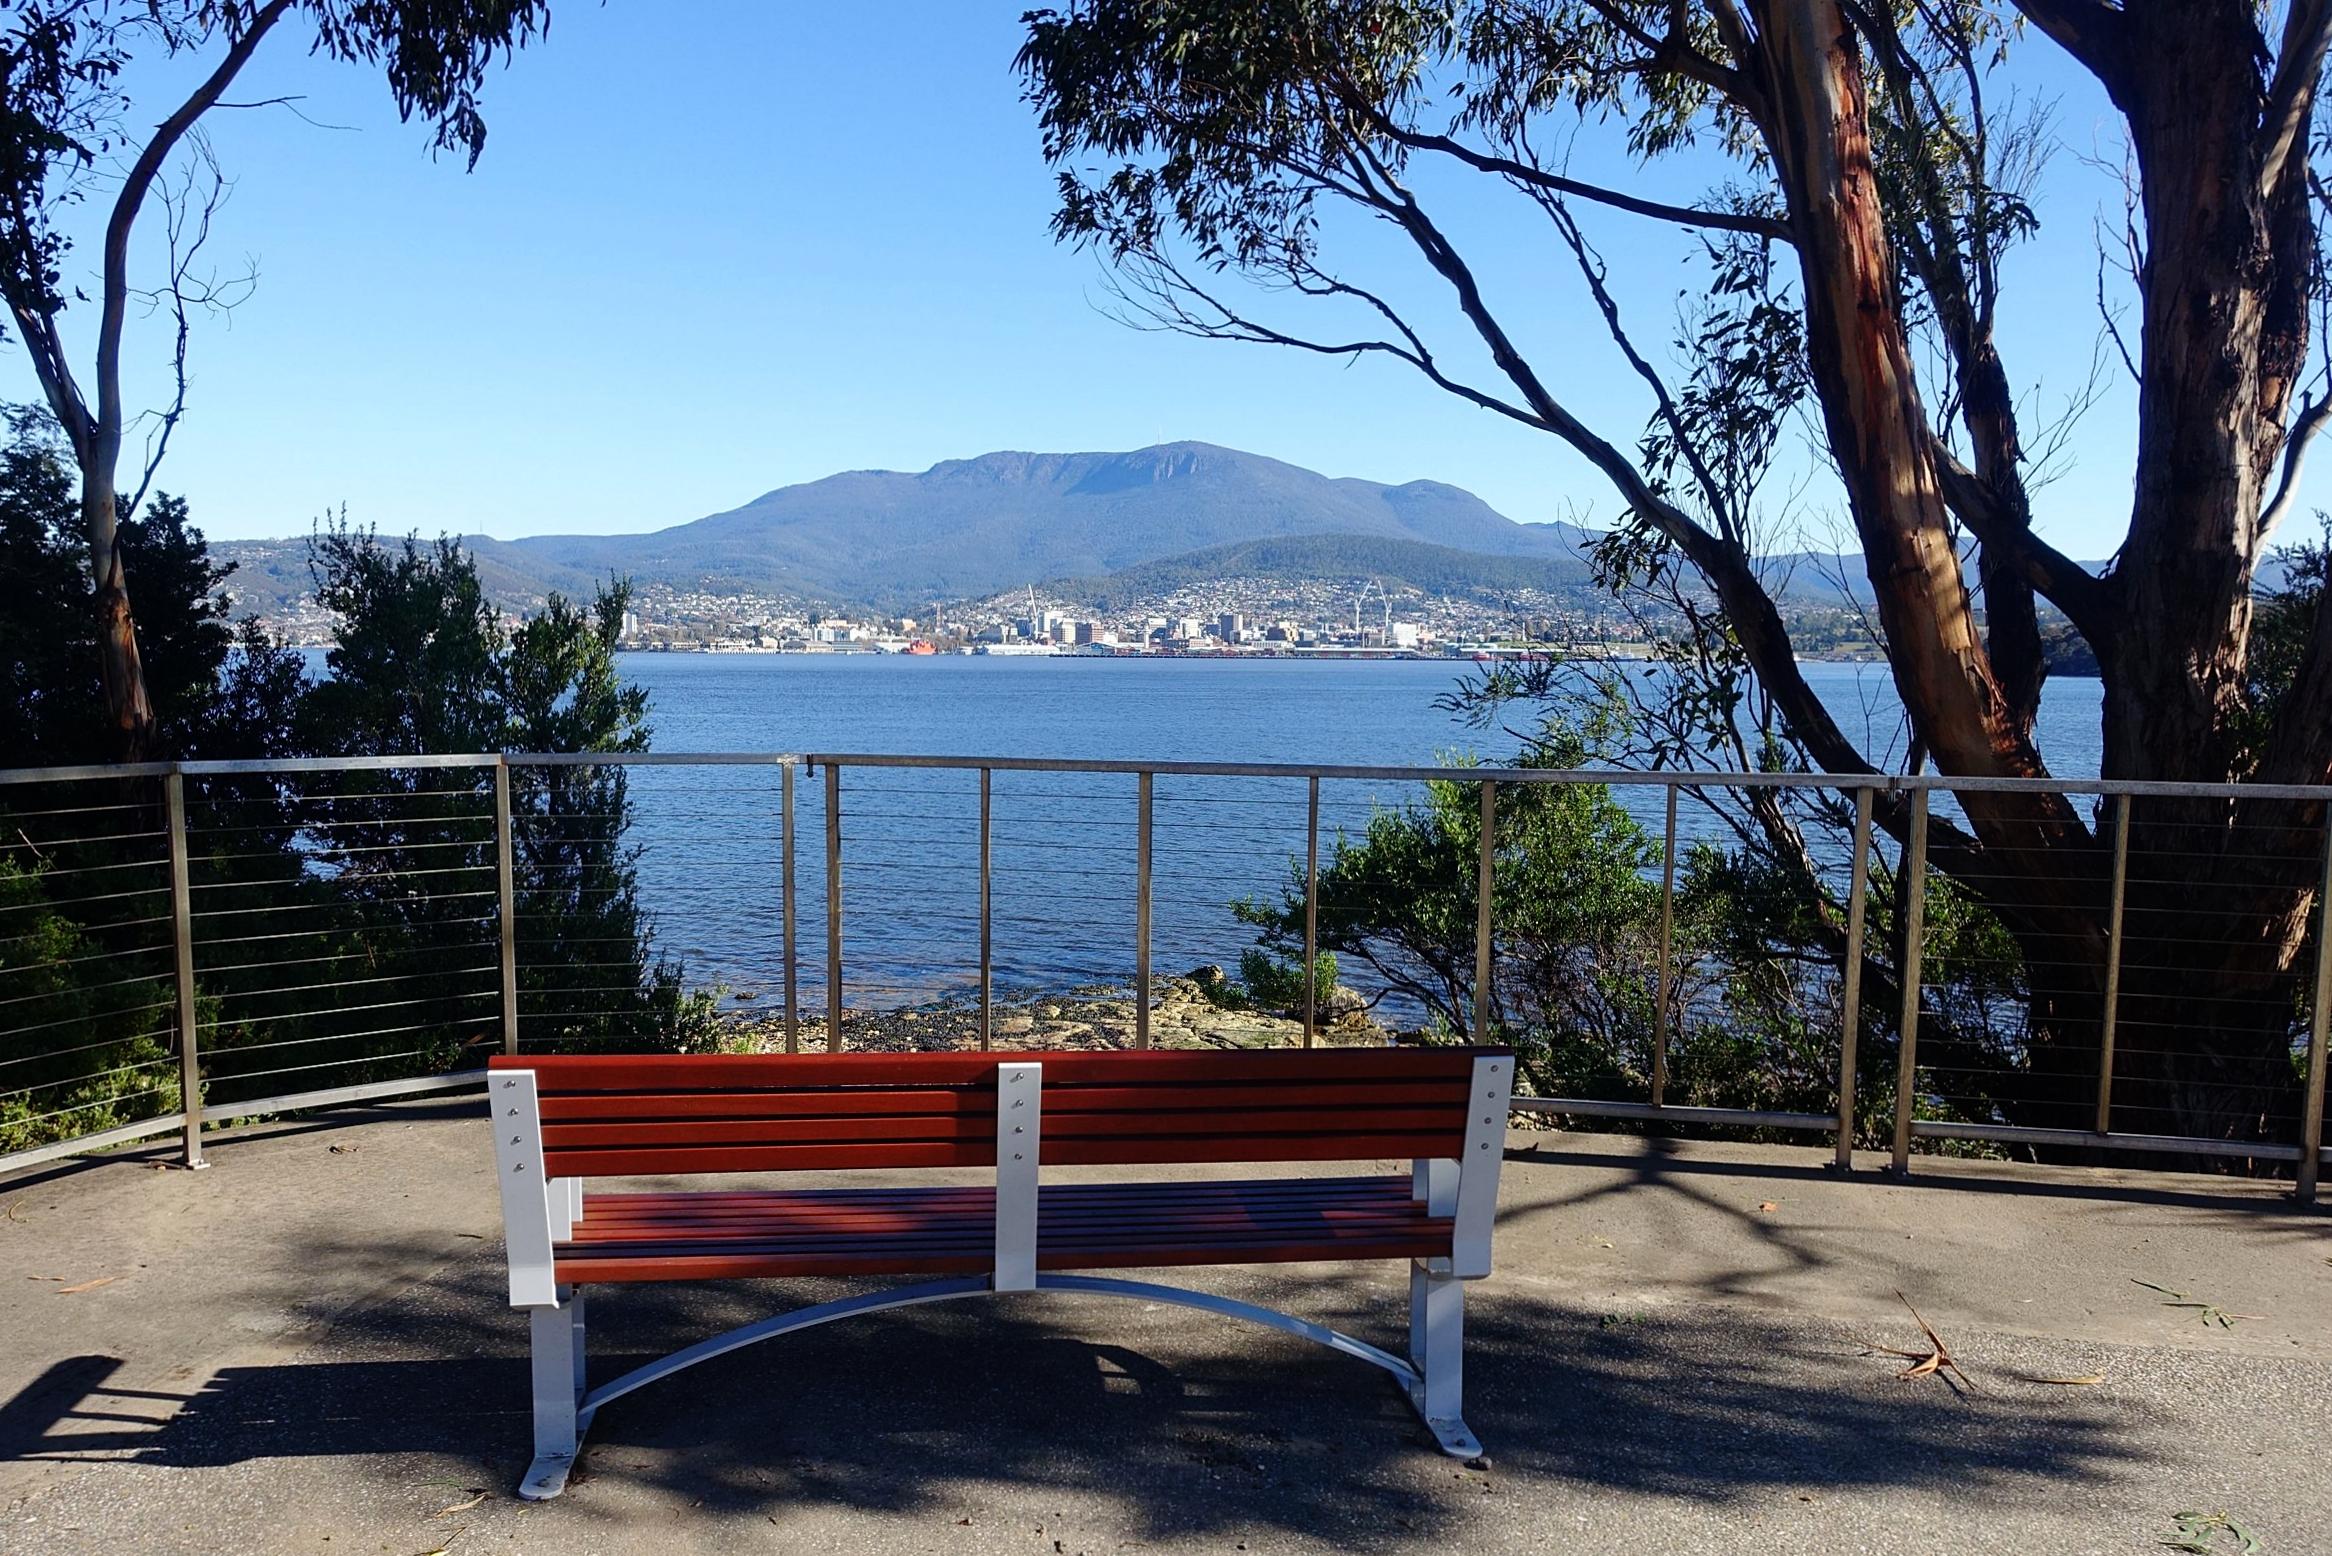 take in the sights on a walk around bellerive bluff